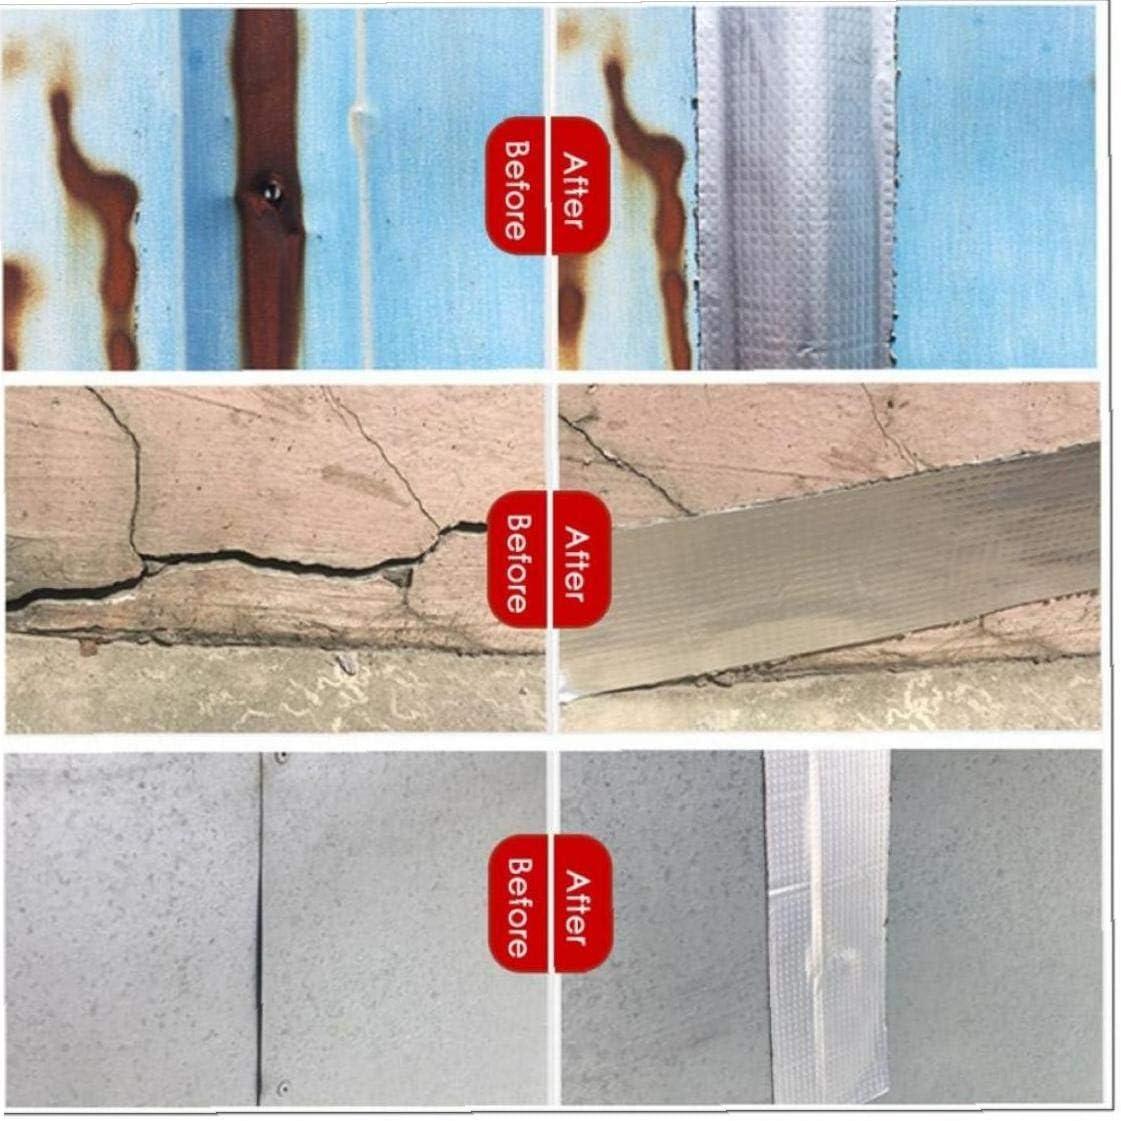 Aluminum Foil Adhesive Tape Waterproof Duct Tape Super Repair Crack Thicken Butyl Waterproof Tape Home Renovation Tools